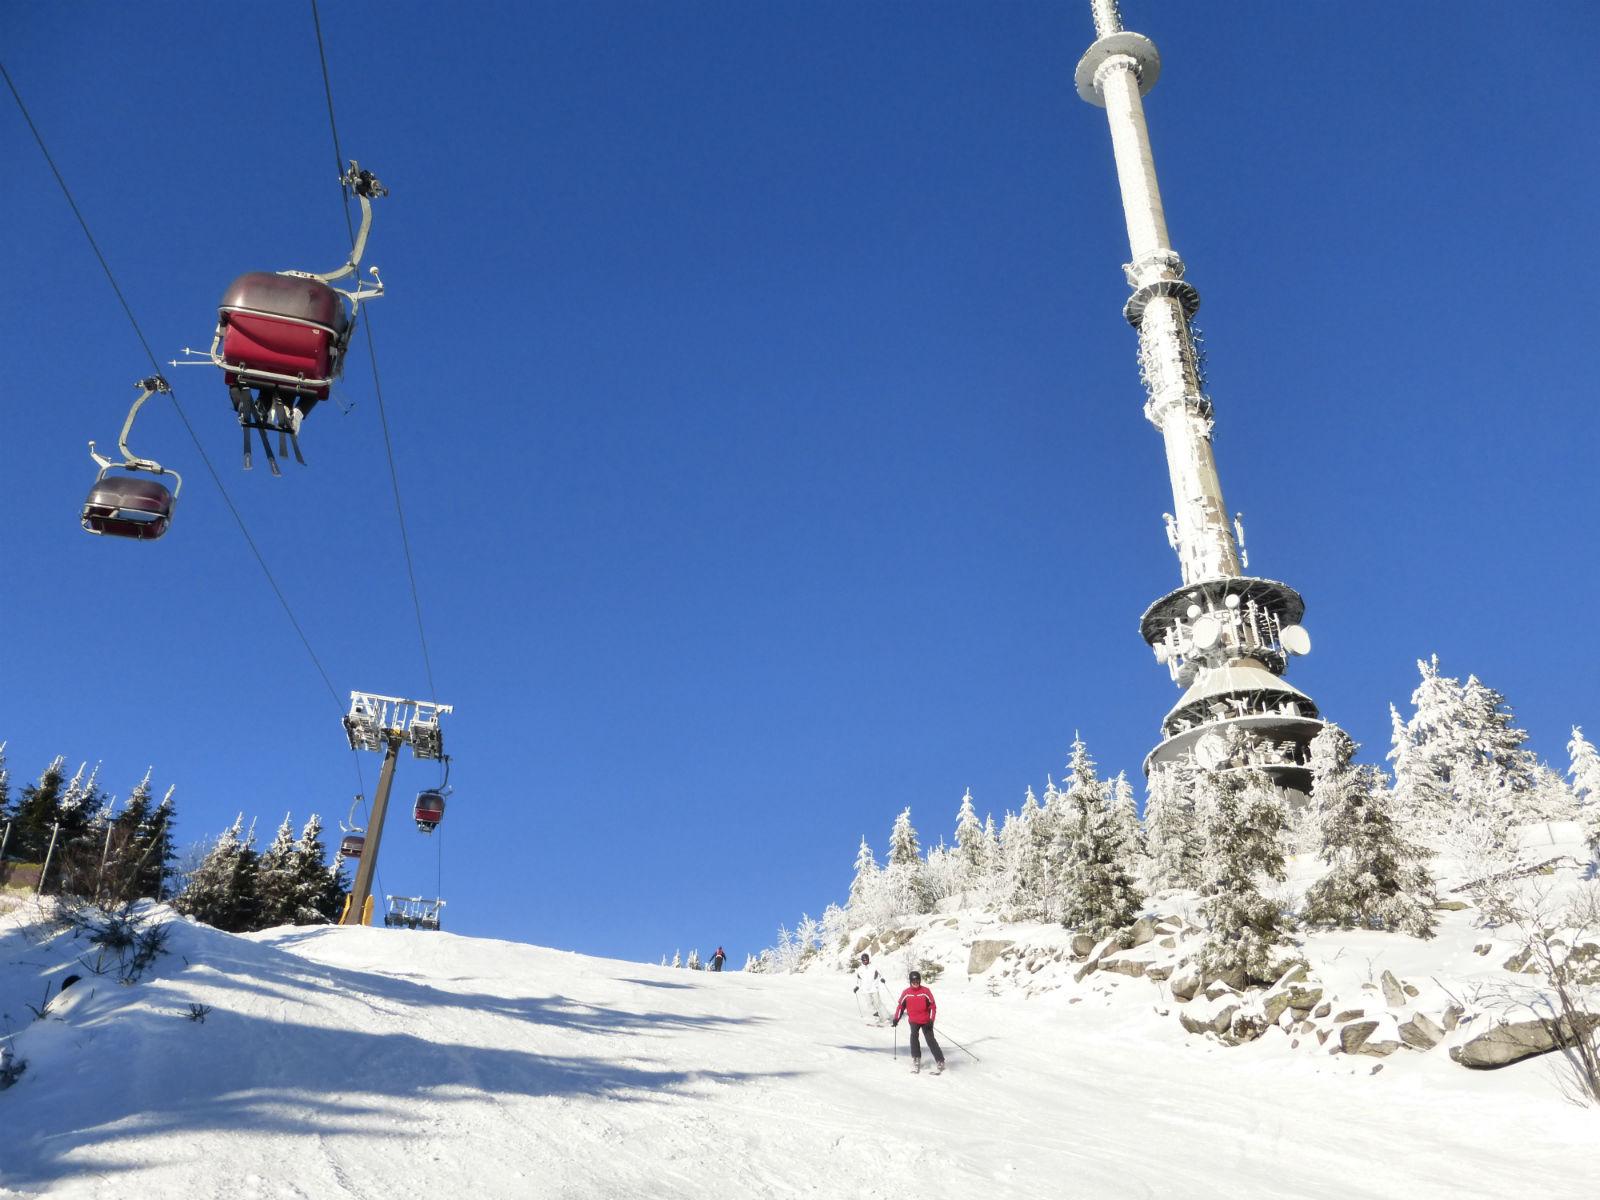 Fichtelgebirge-Wintersport-Skifahren-Ochsenkopf-Seilbahn